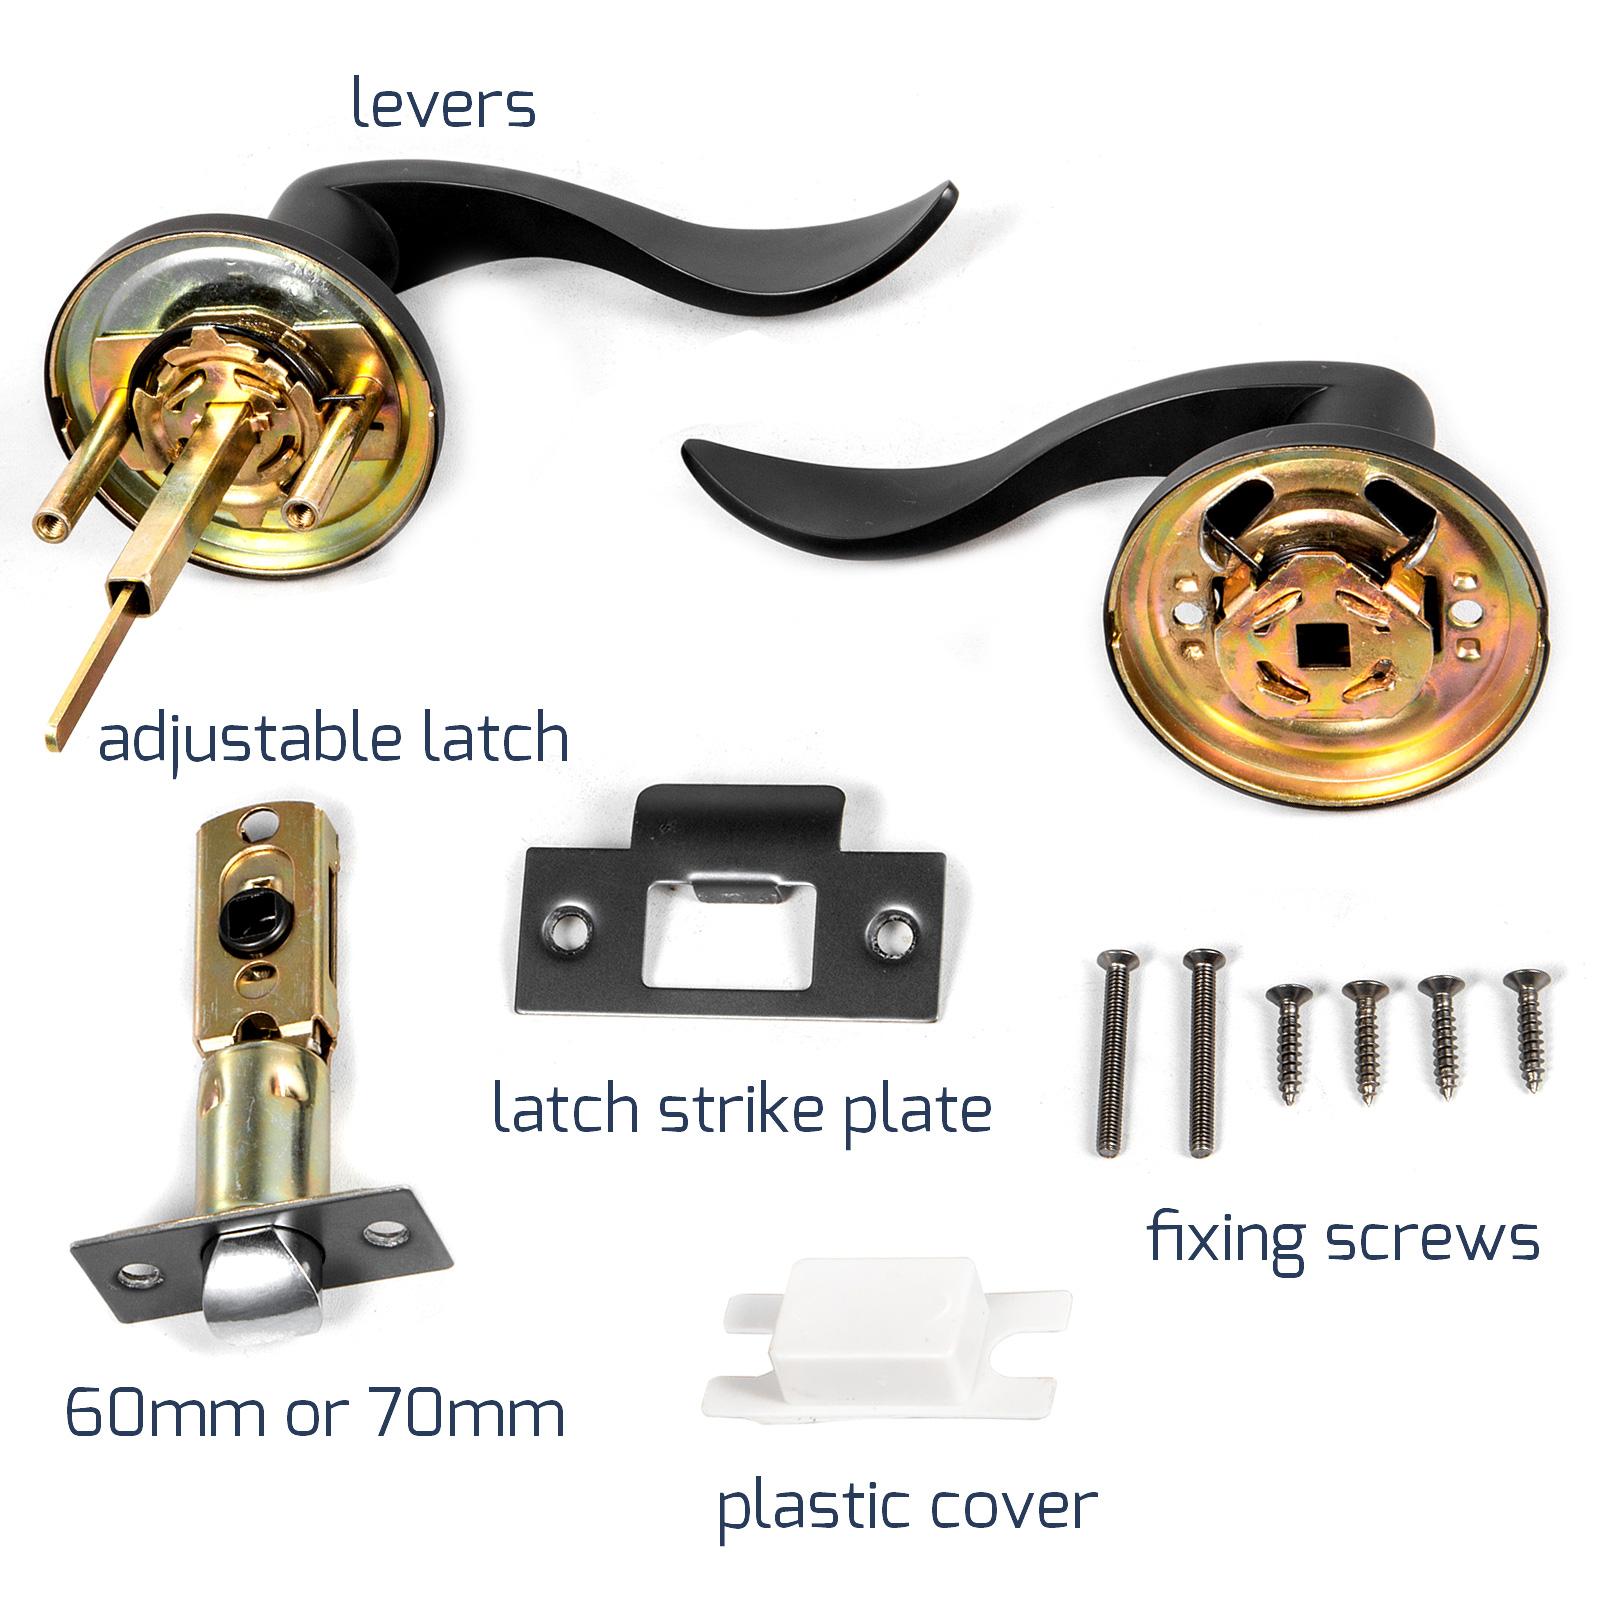 Door-Handles-Matte-Black-Door-Lever-3-5-10-Pack-Passage-Privace-Entry-Lock-Set thumbnail 117